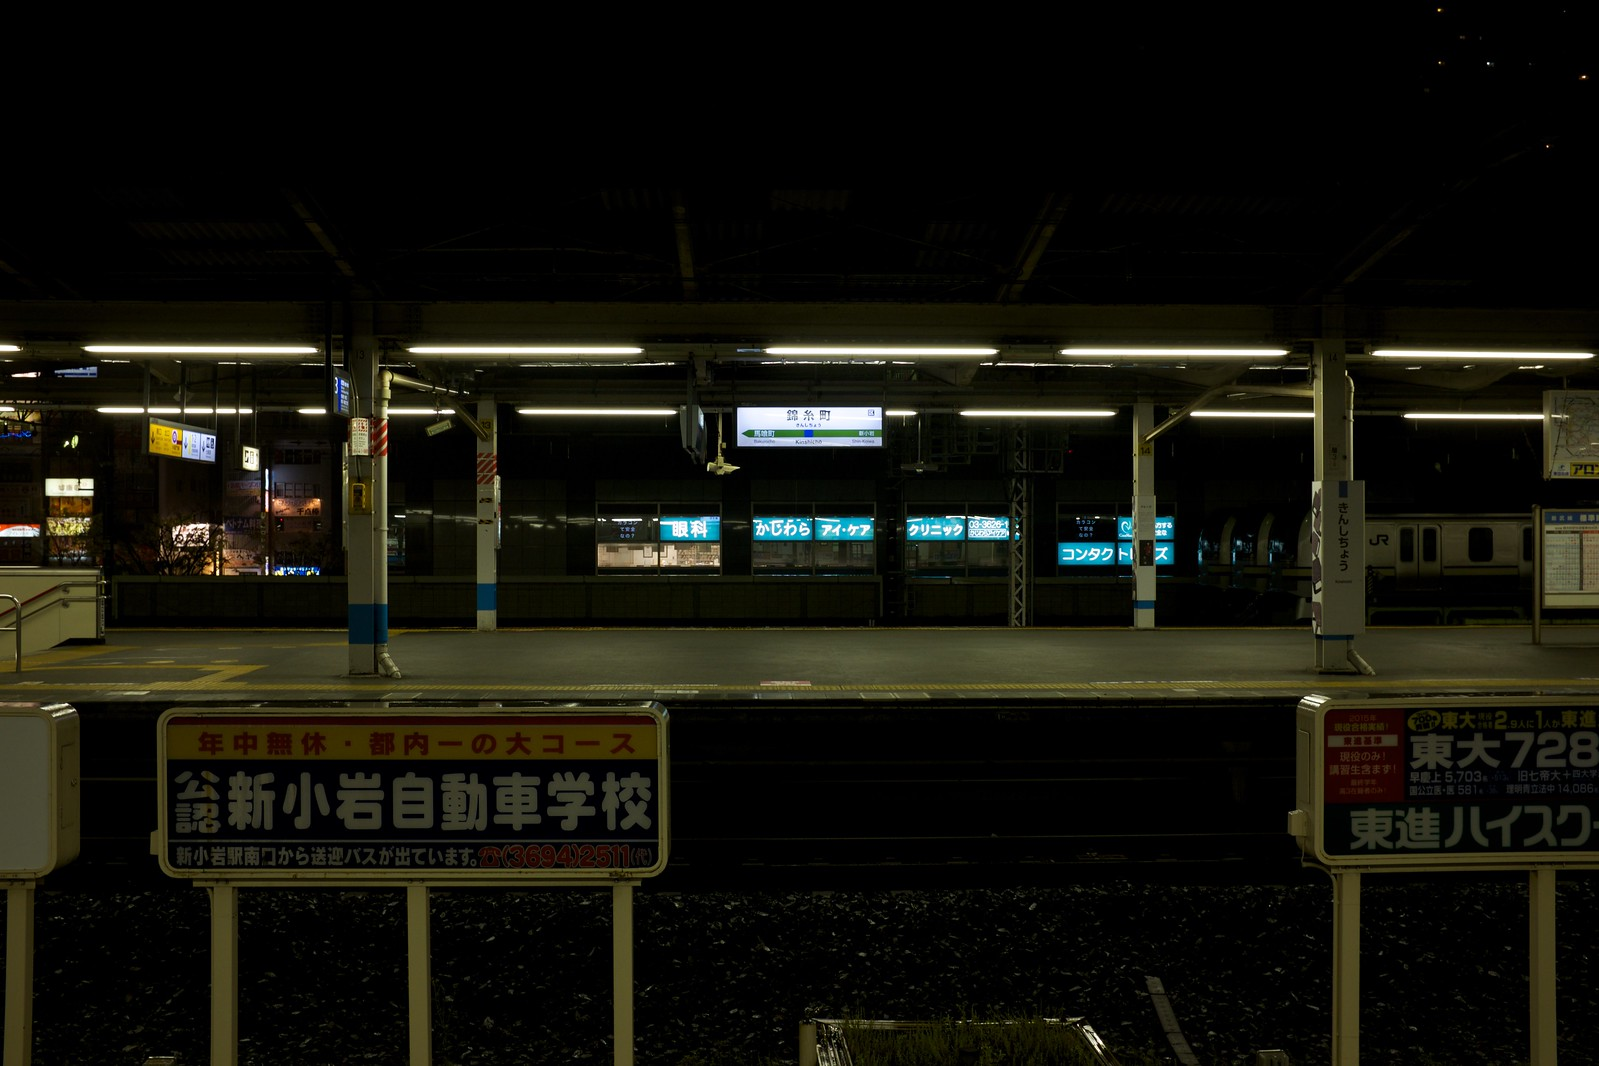 Kinshicho station in Tokyo, Japan,